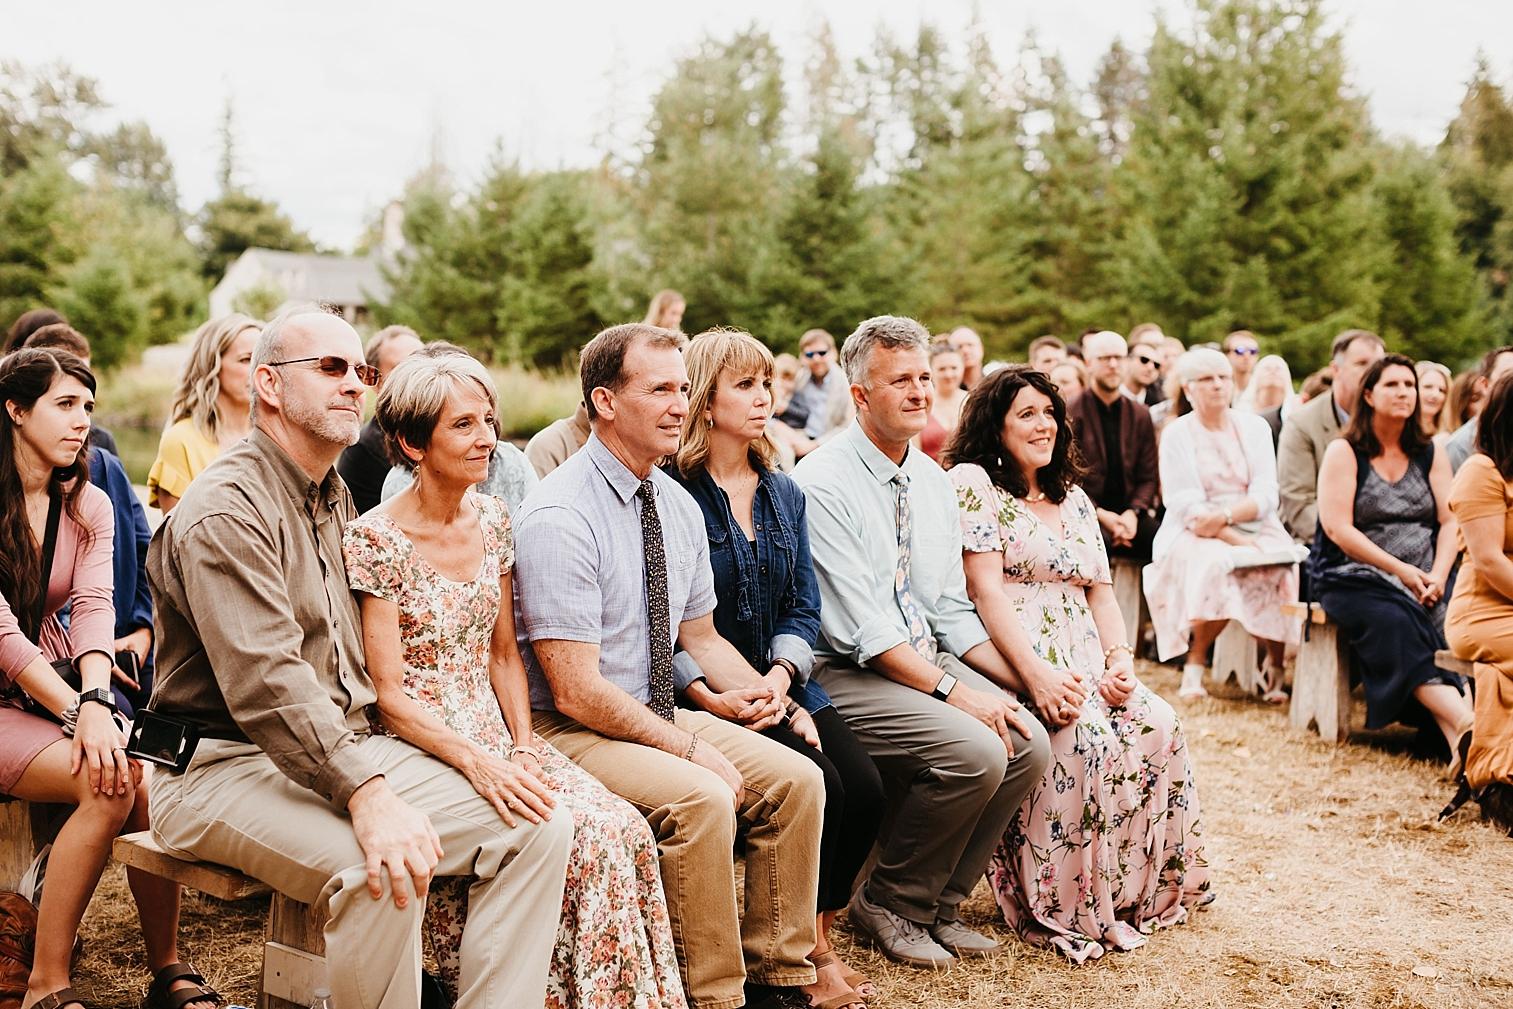 Summer-Camp-Themed-Wedding-87.jpg